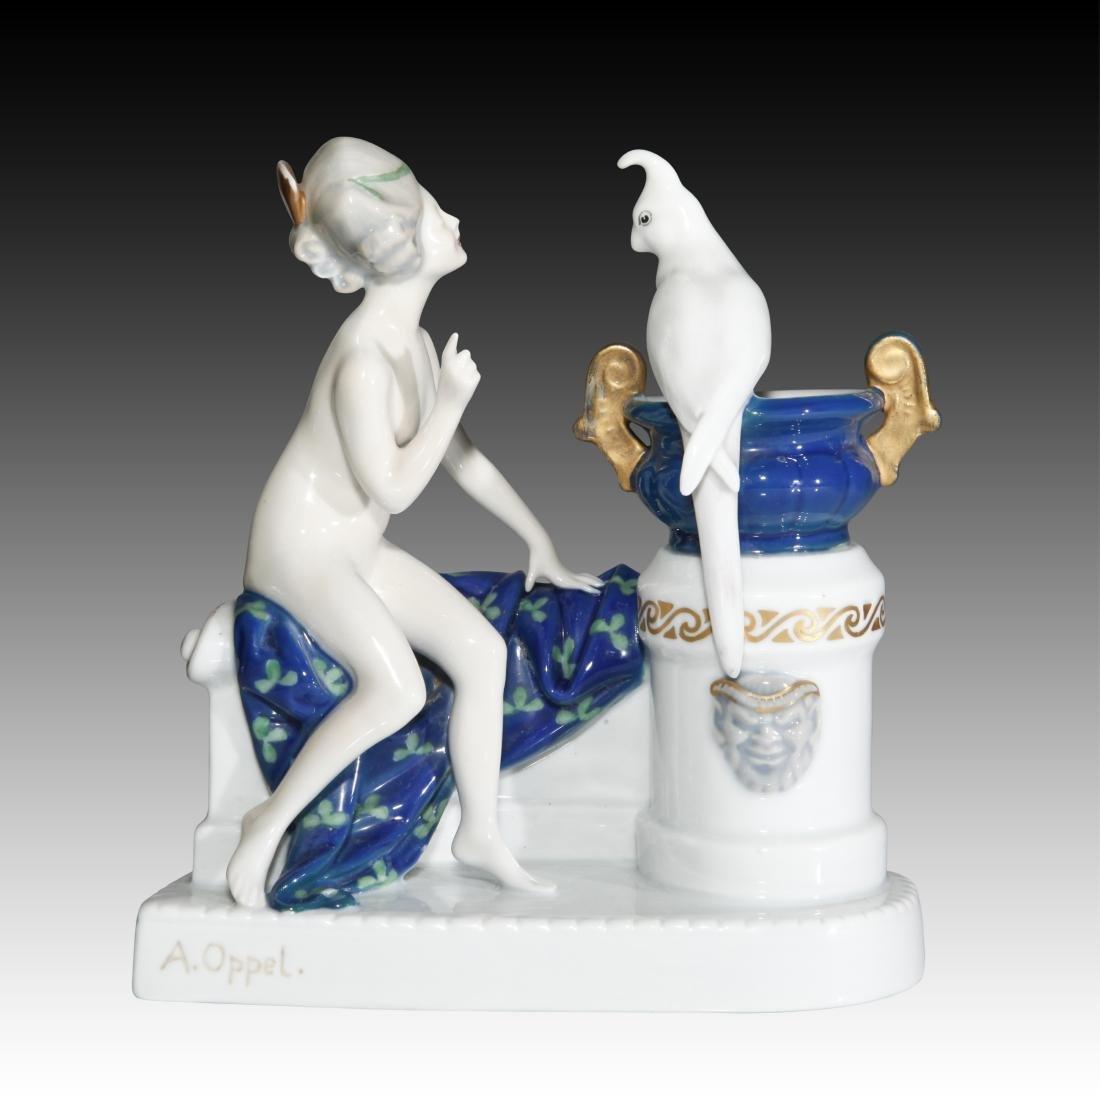 Rosenthal Figurine Nude Venus with Parrot